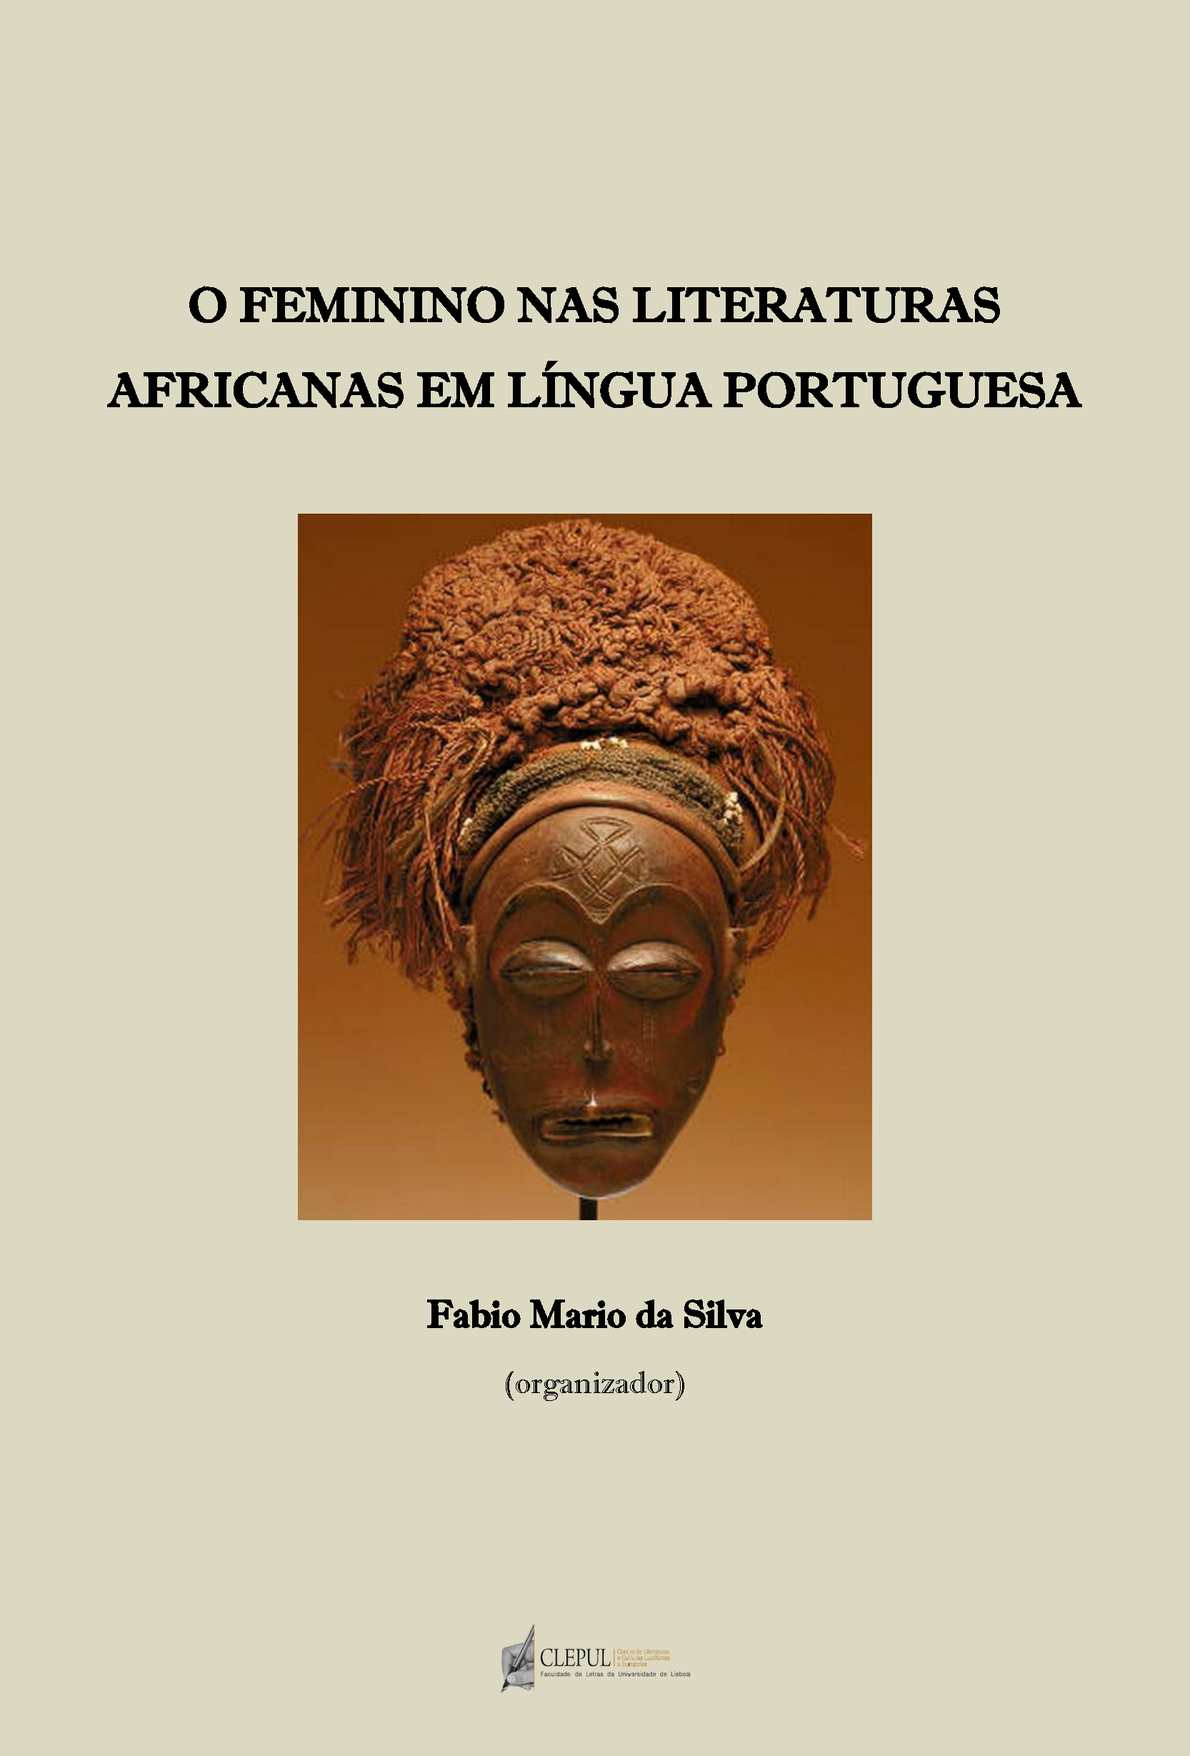 Calamo o feminino nas literaturas africanas em lngua portuguesa fandeluxe Image collections